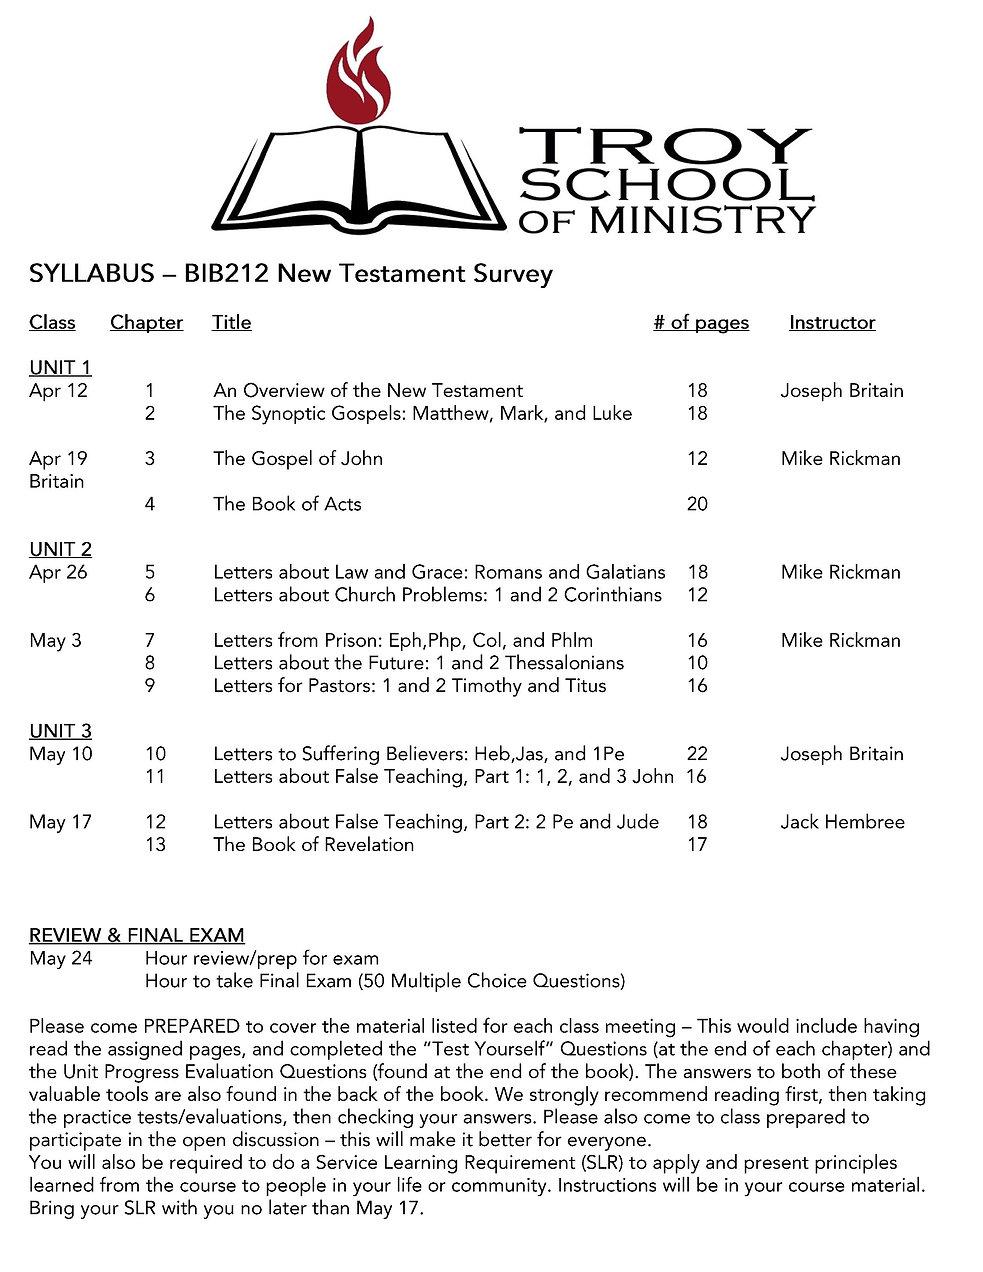 BIB212 - New Testament Survey Syllabus.j